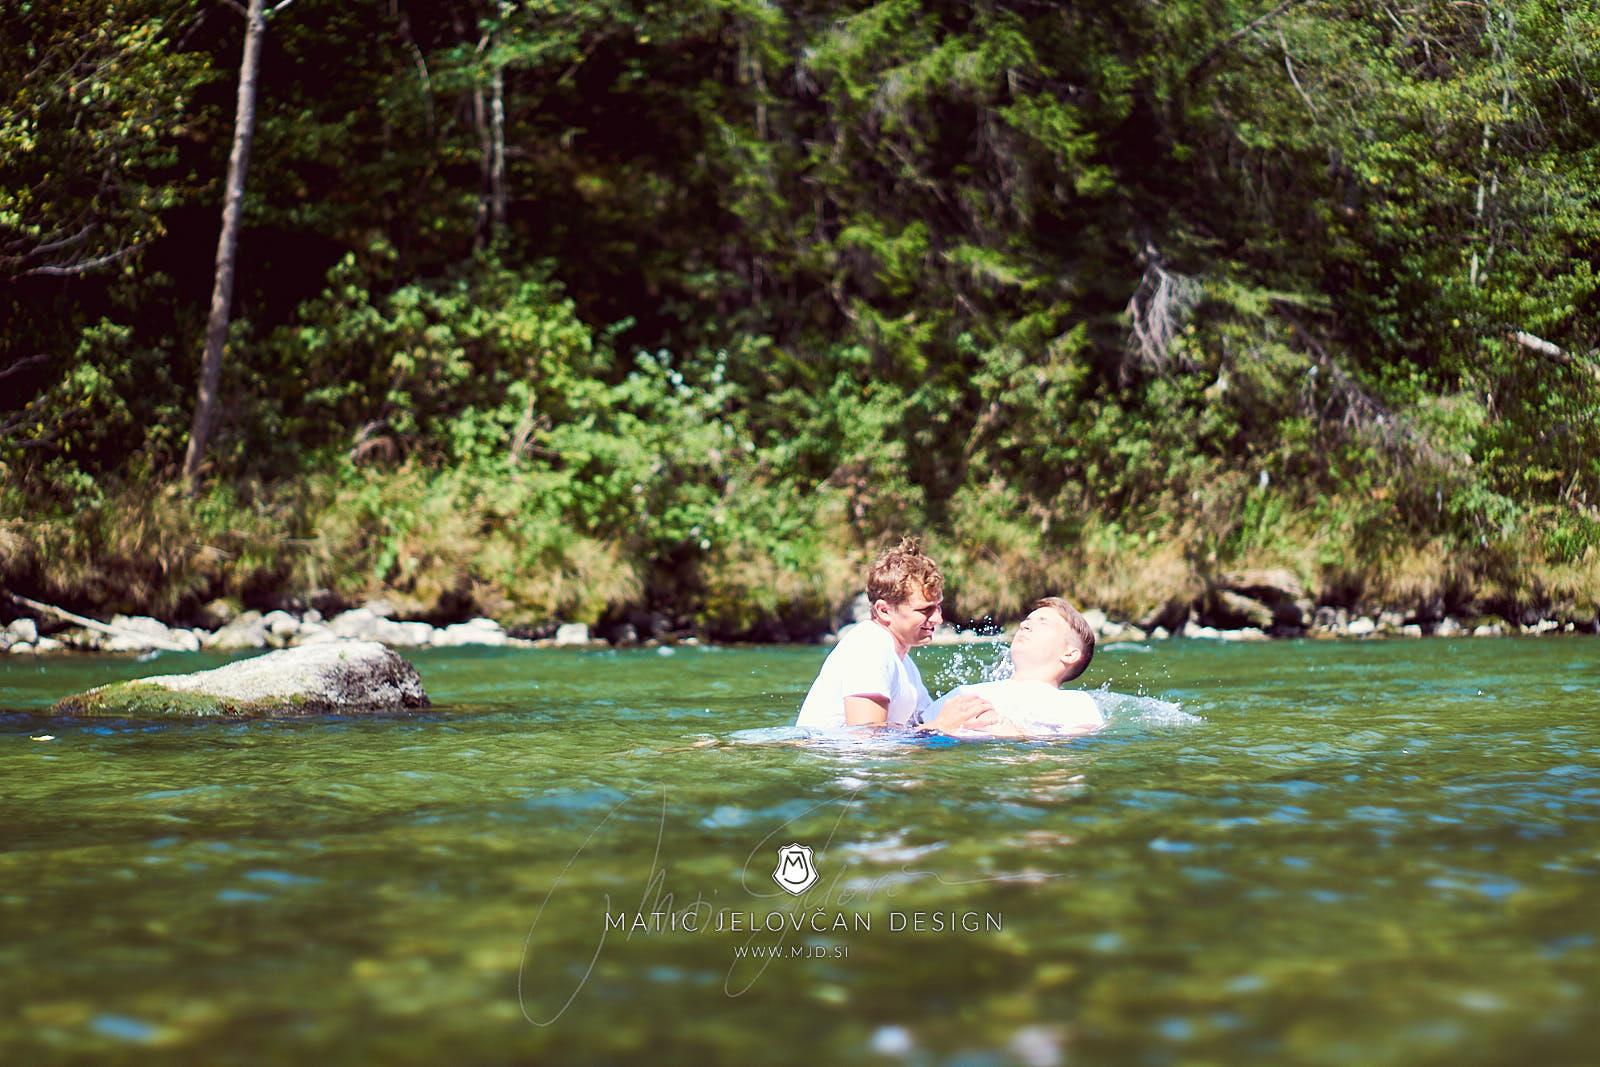 2017 08 27 14.38.53DSC01645 Web - Church Picnic and Baptism